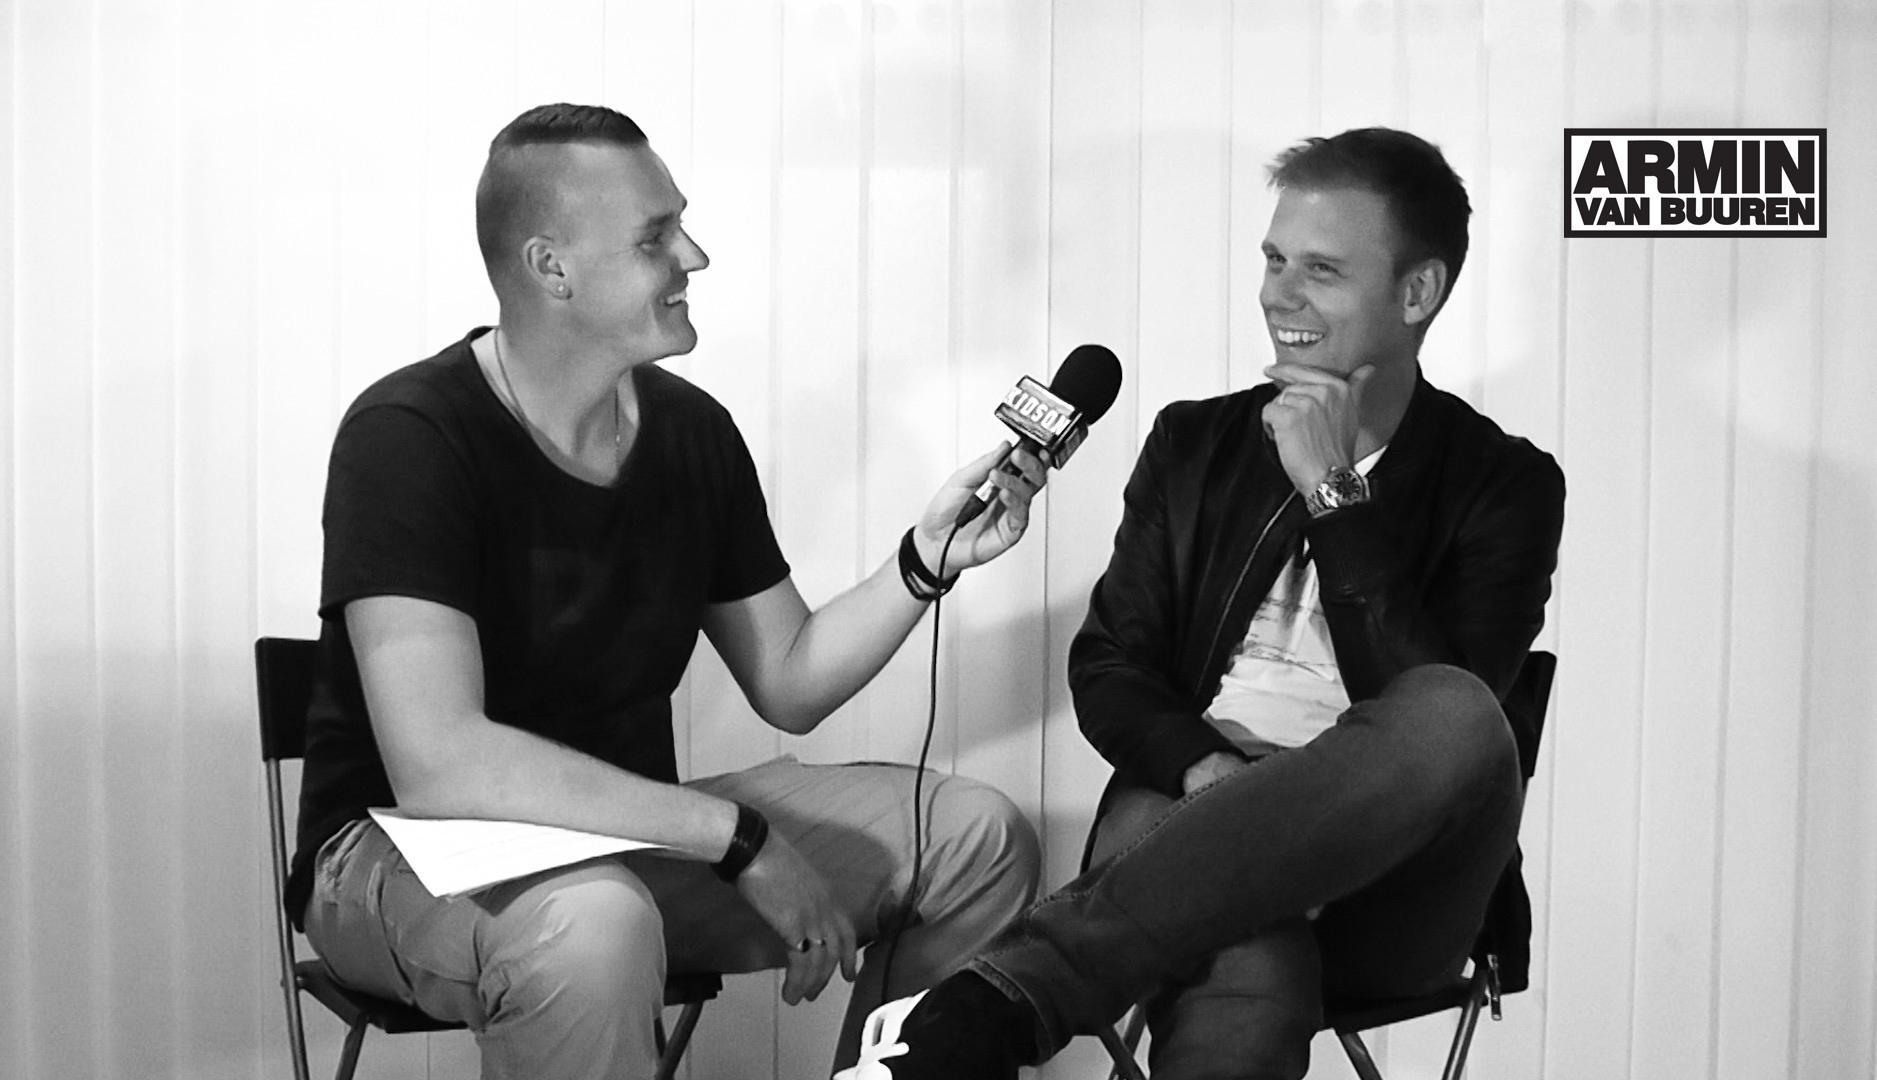 Entrevista exclusiva de Viktor Kidson com Armin Van Buuren em Estocolmo